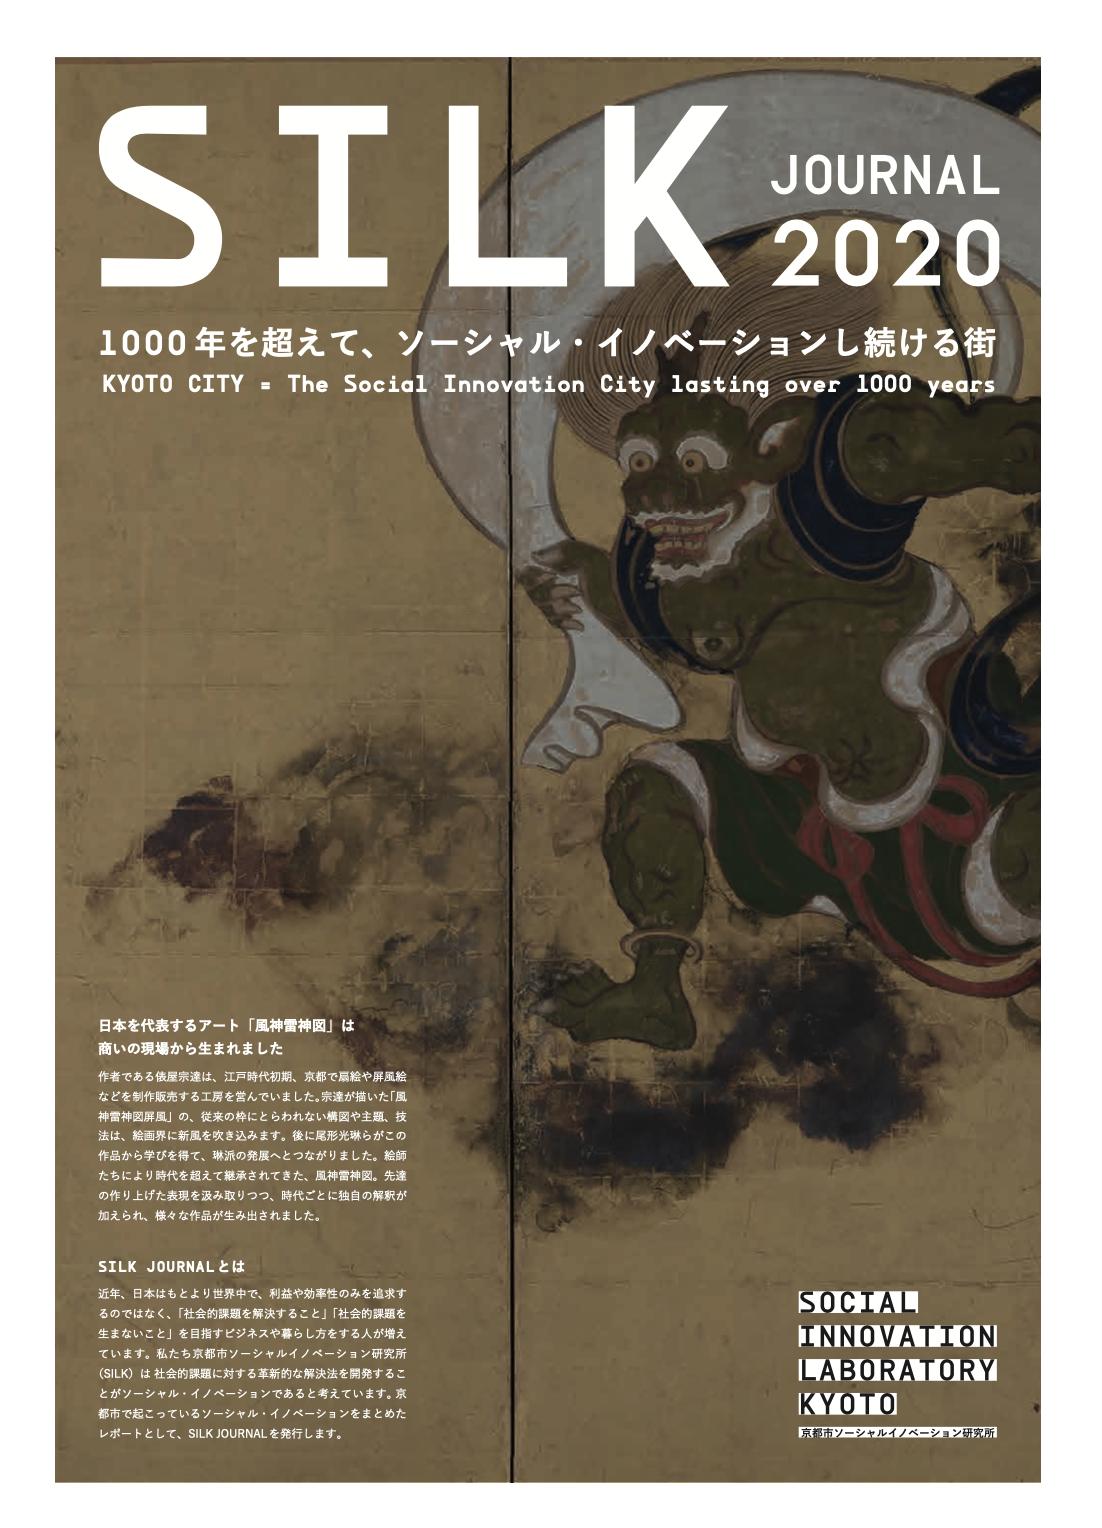 SILK JOURNAL 2020 -1000年を超えて、ソーシャル・イノベーションし続ける街-